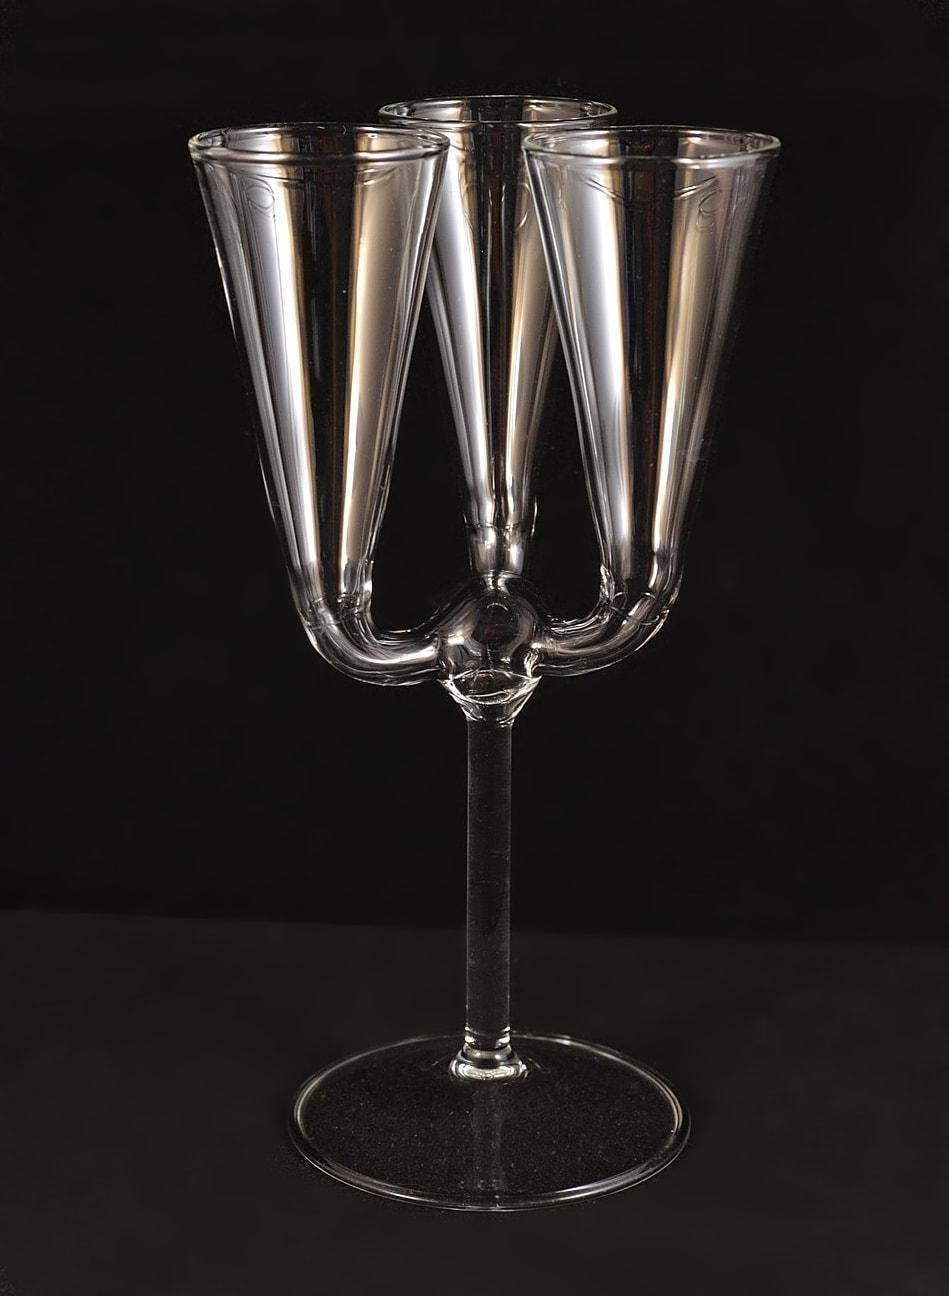 Triple glass